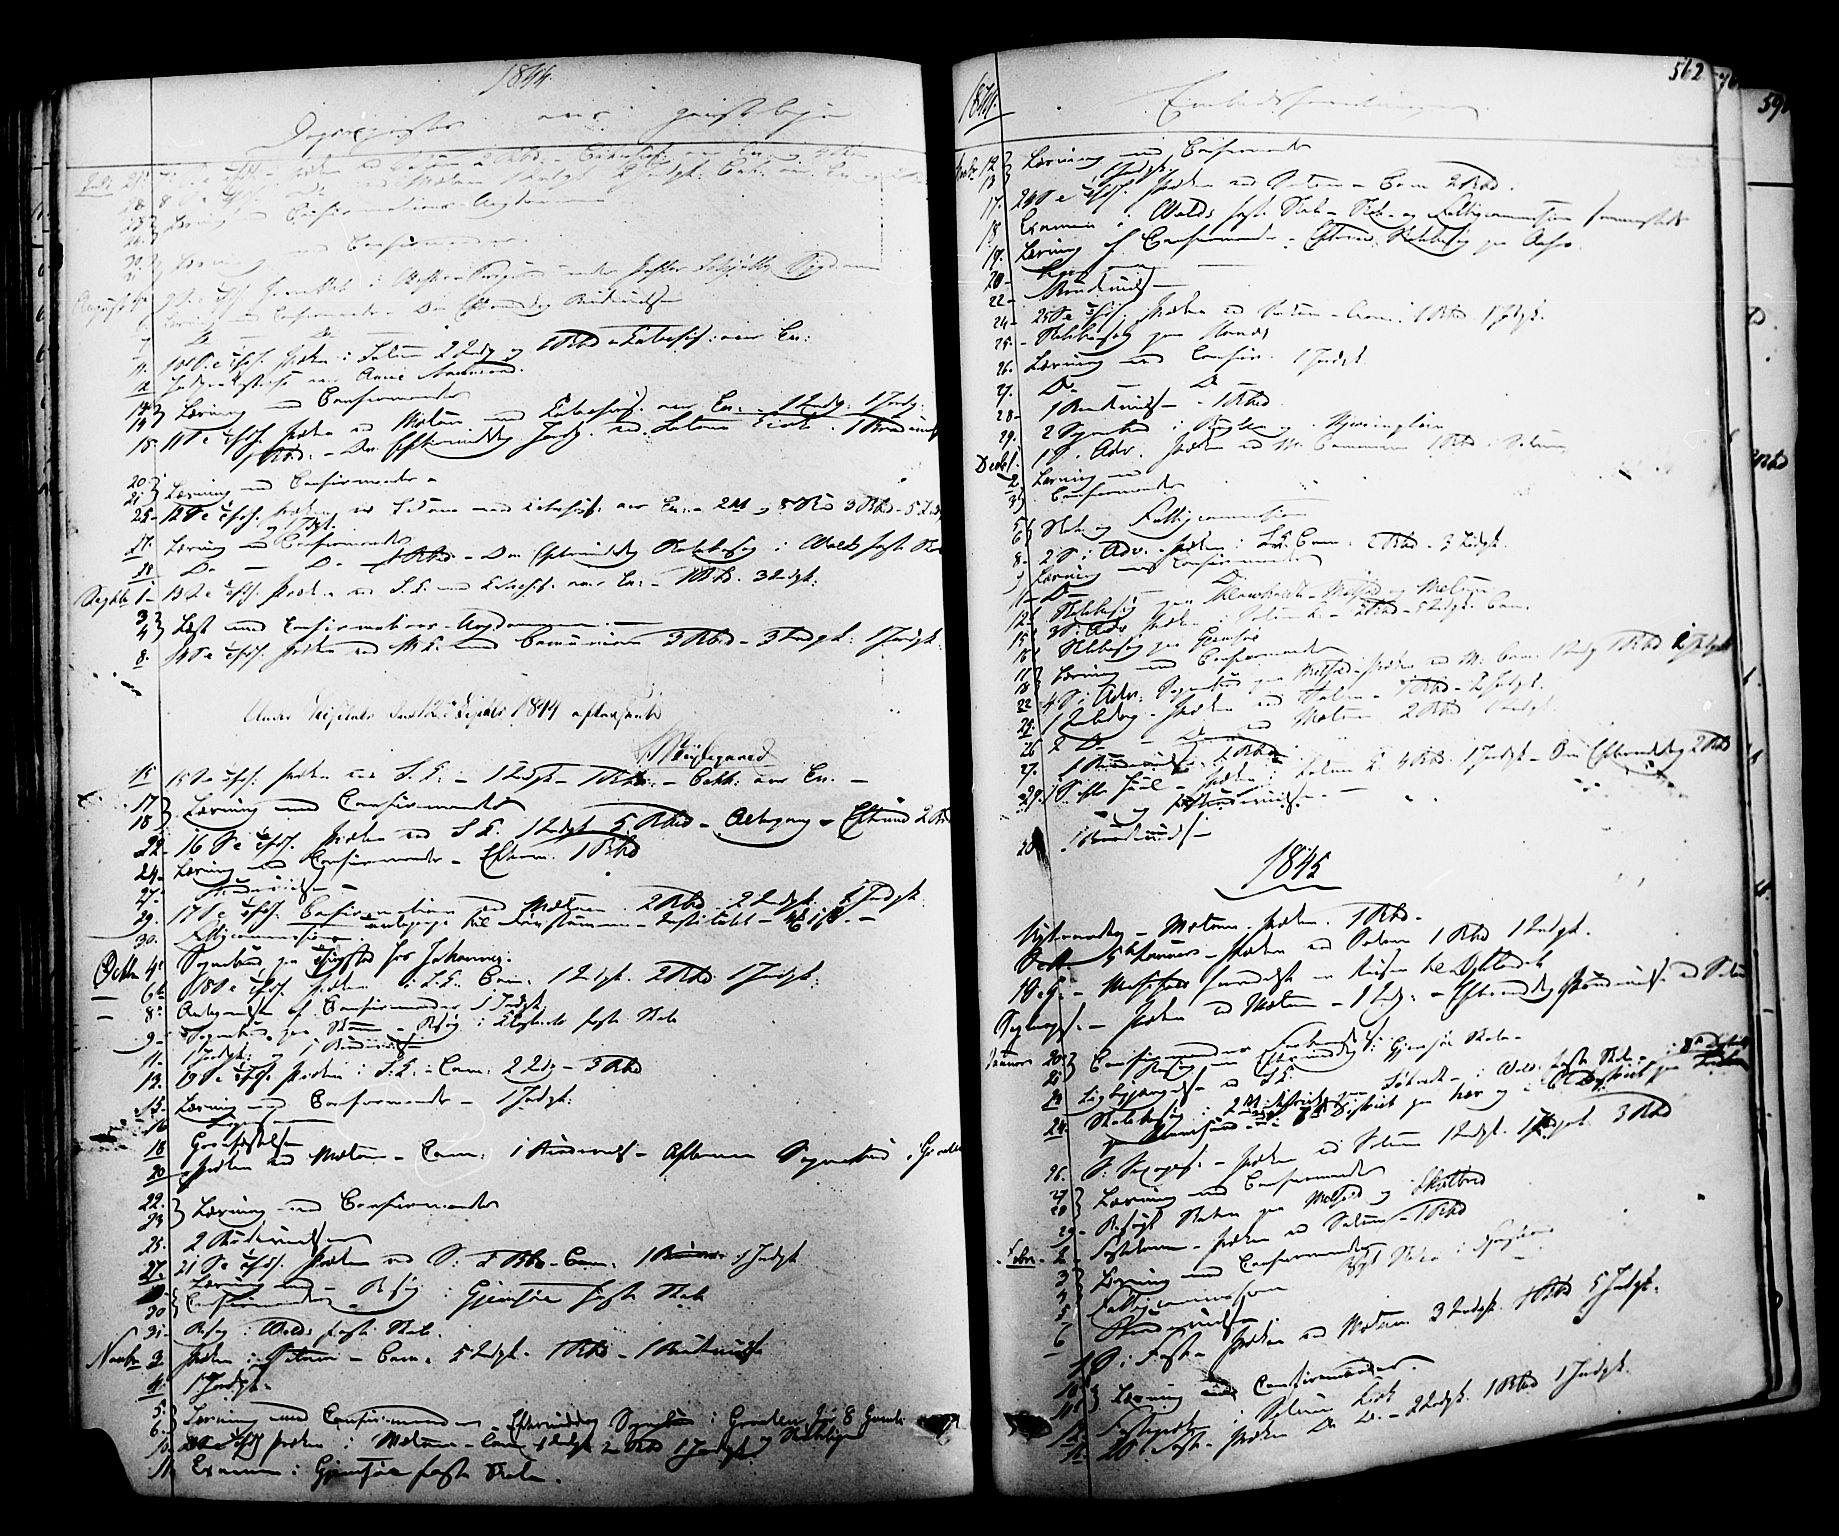 SAKO, Solum kirkebøker, F/Fa/L0006: Ministerialbok nr. I 6, 1844-1855, s. 562